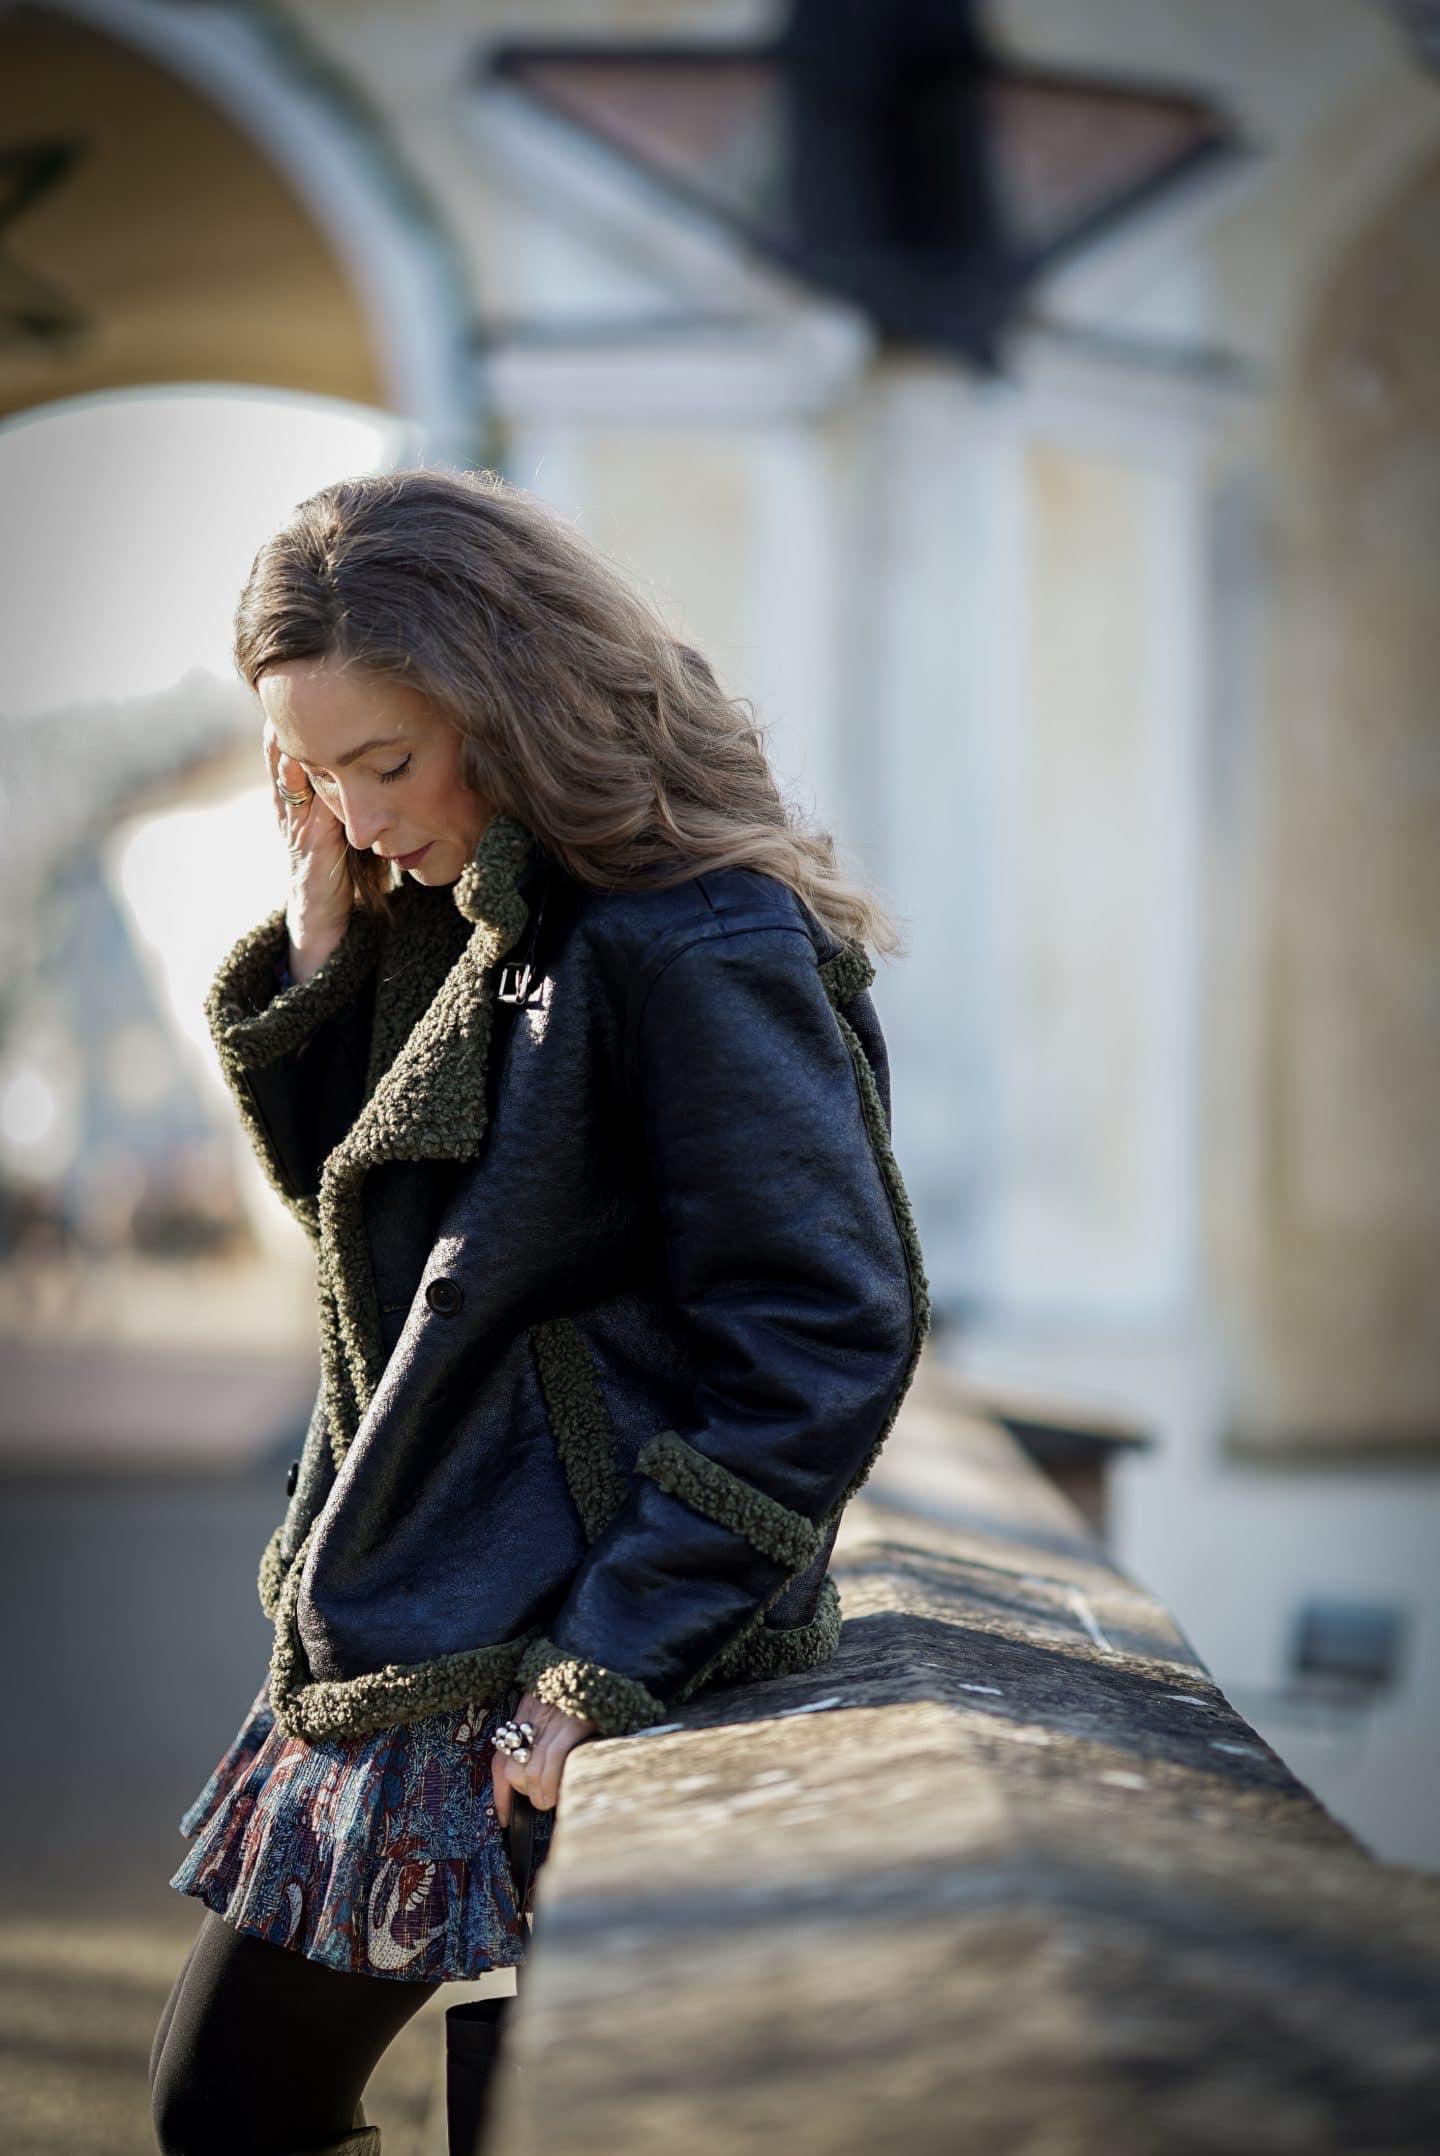 Stil-Inspo Ü 40 Bloggerin Nicki Nowicki